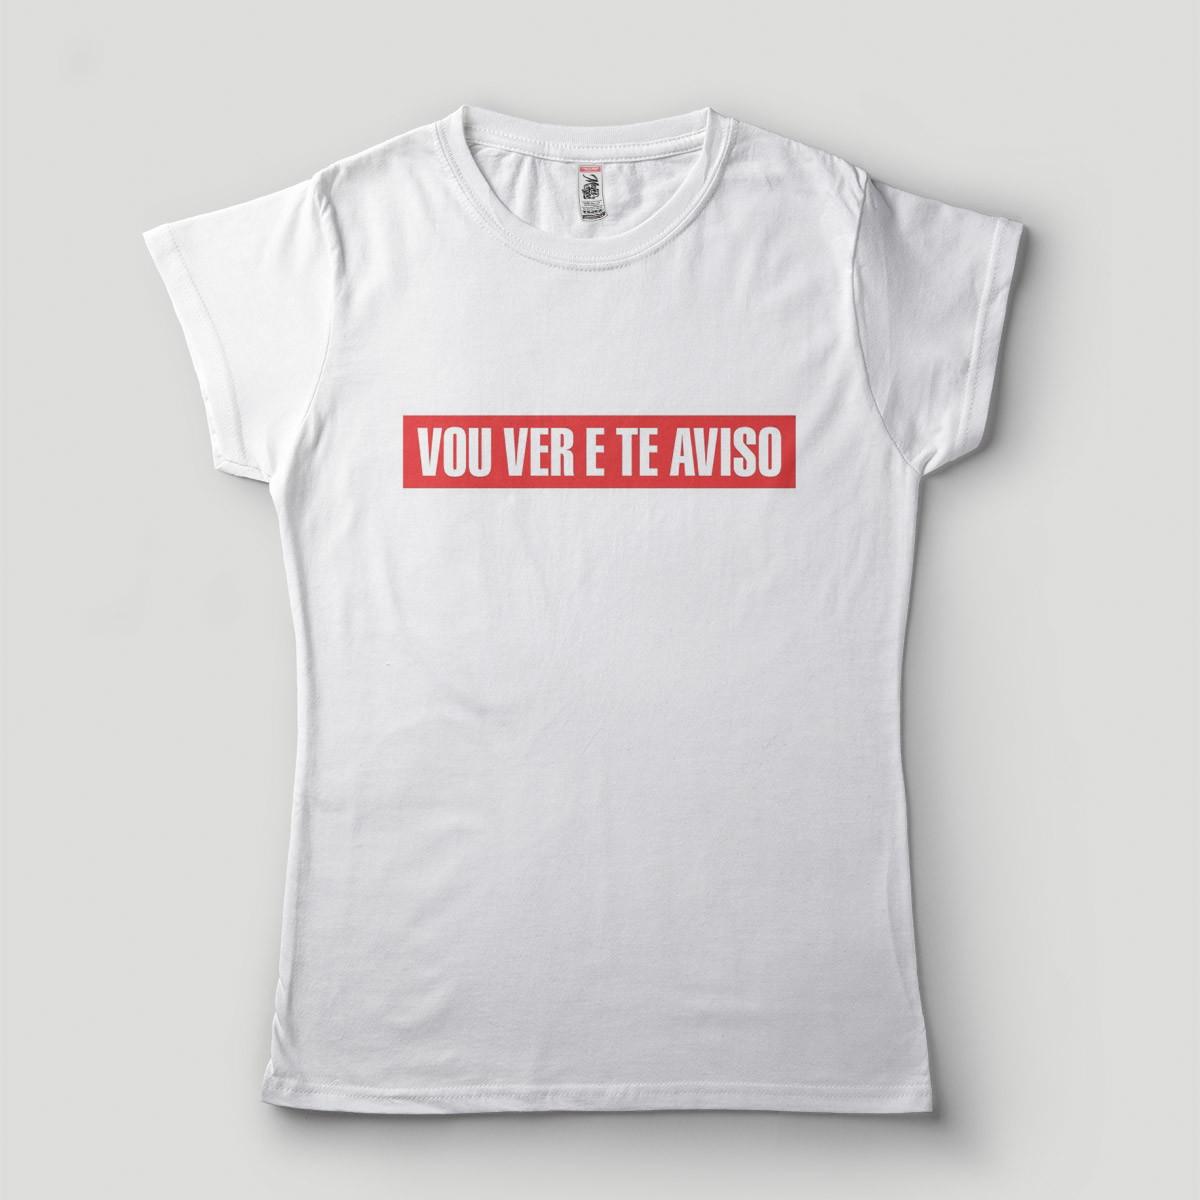 63f4089c5 Blusa Feminina Vou ver e te aviso Camiseta divertida Humor no Elo7 ...